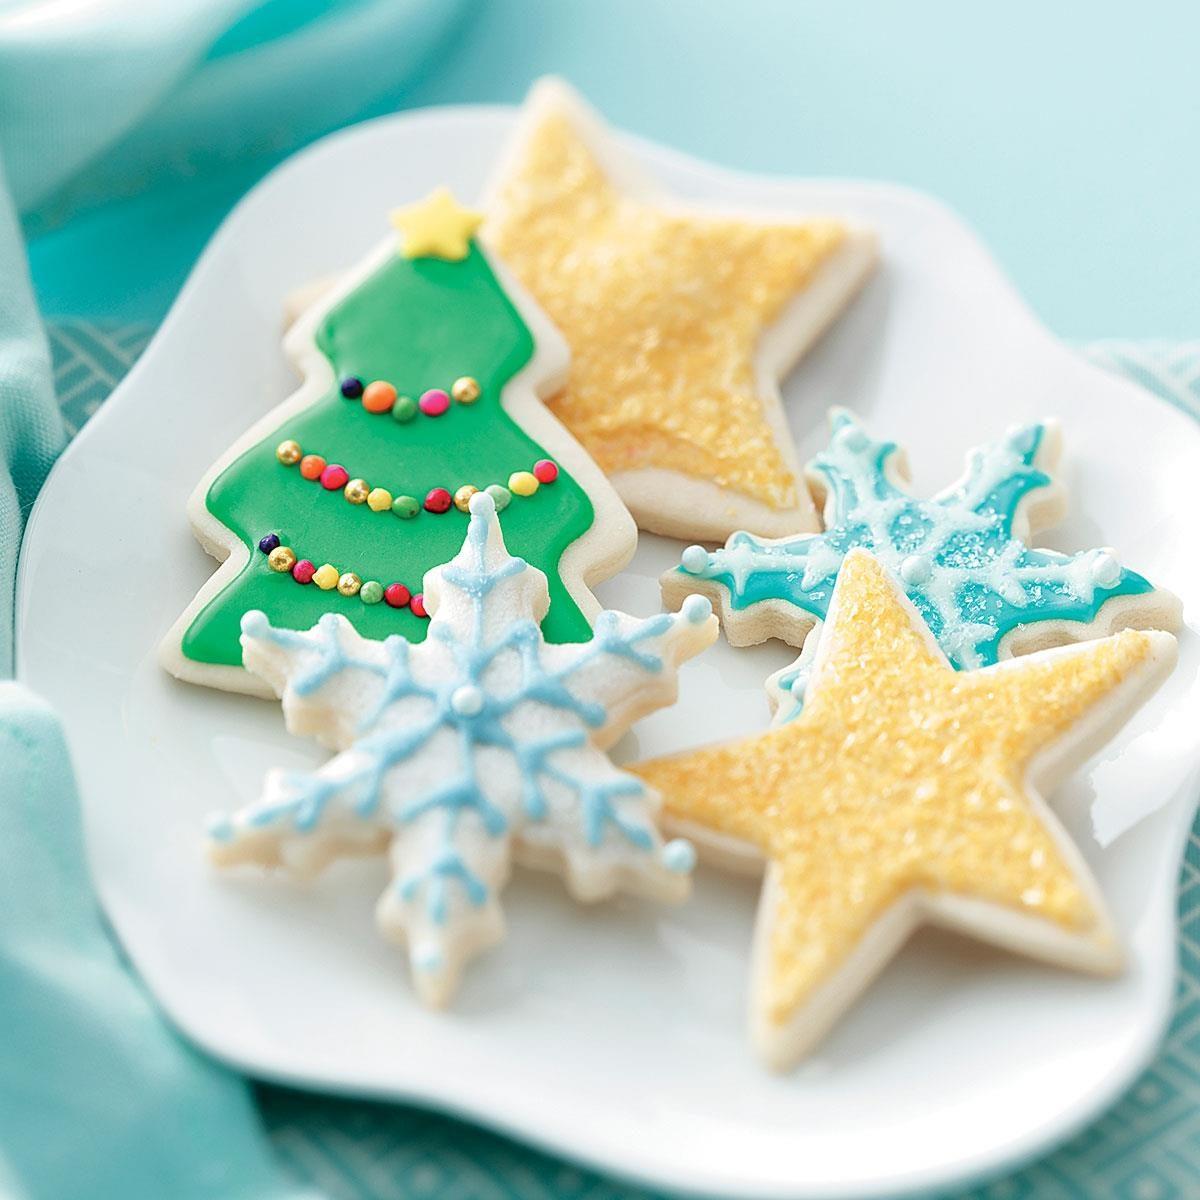 How to make christmas sugar cookies - How To Make Christmas Sugar Cookies 19